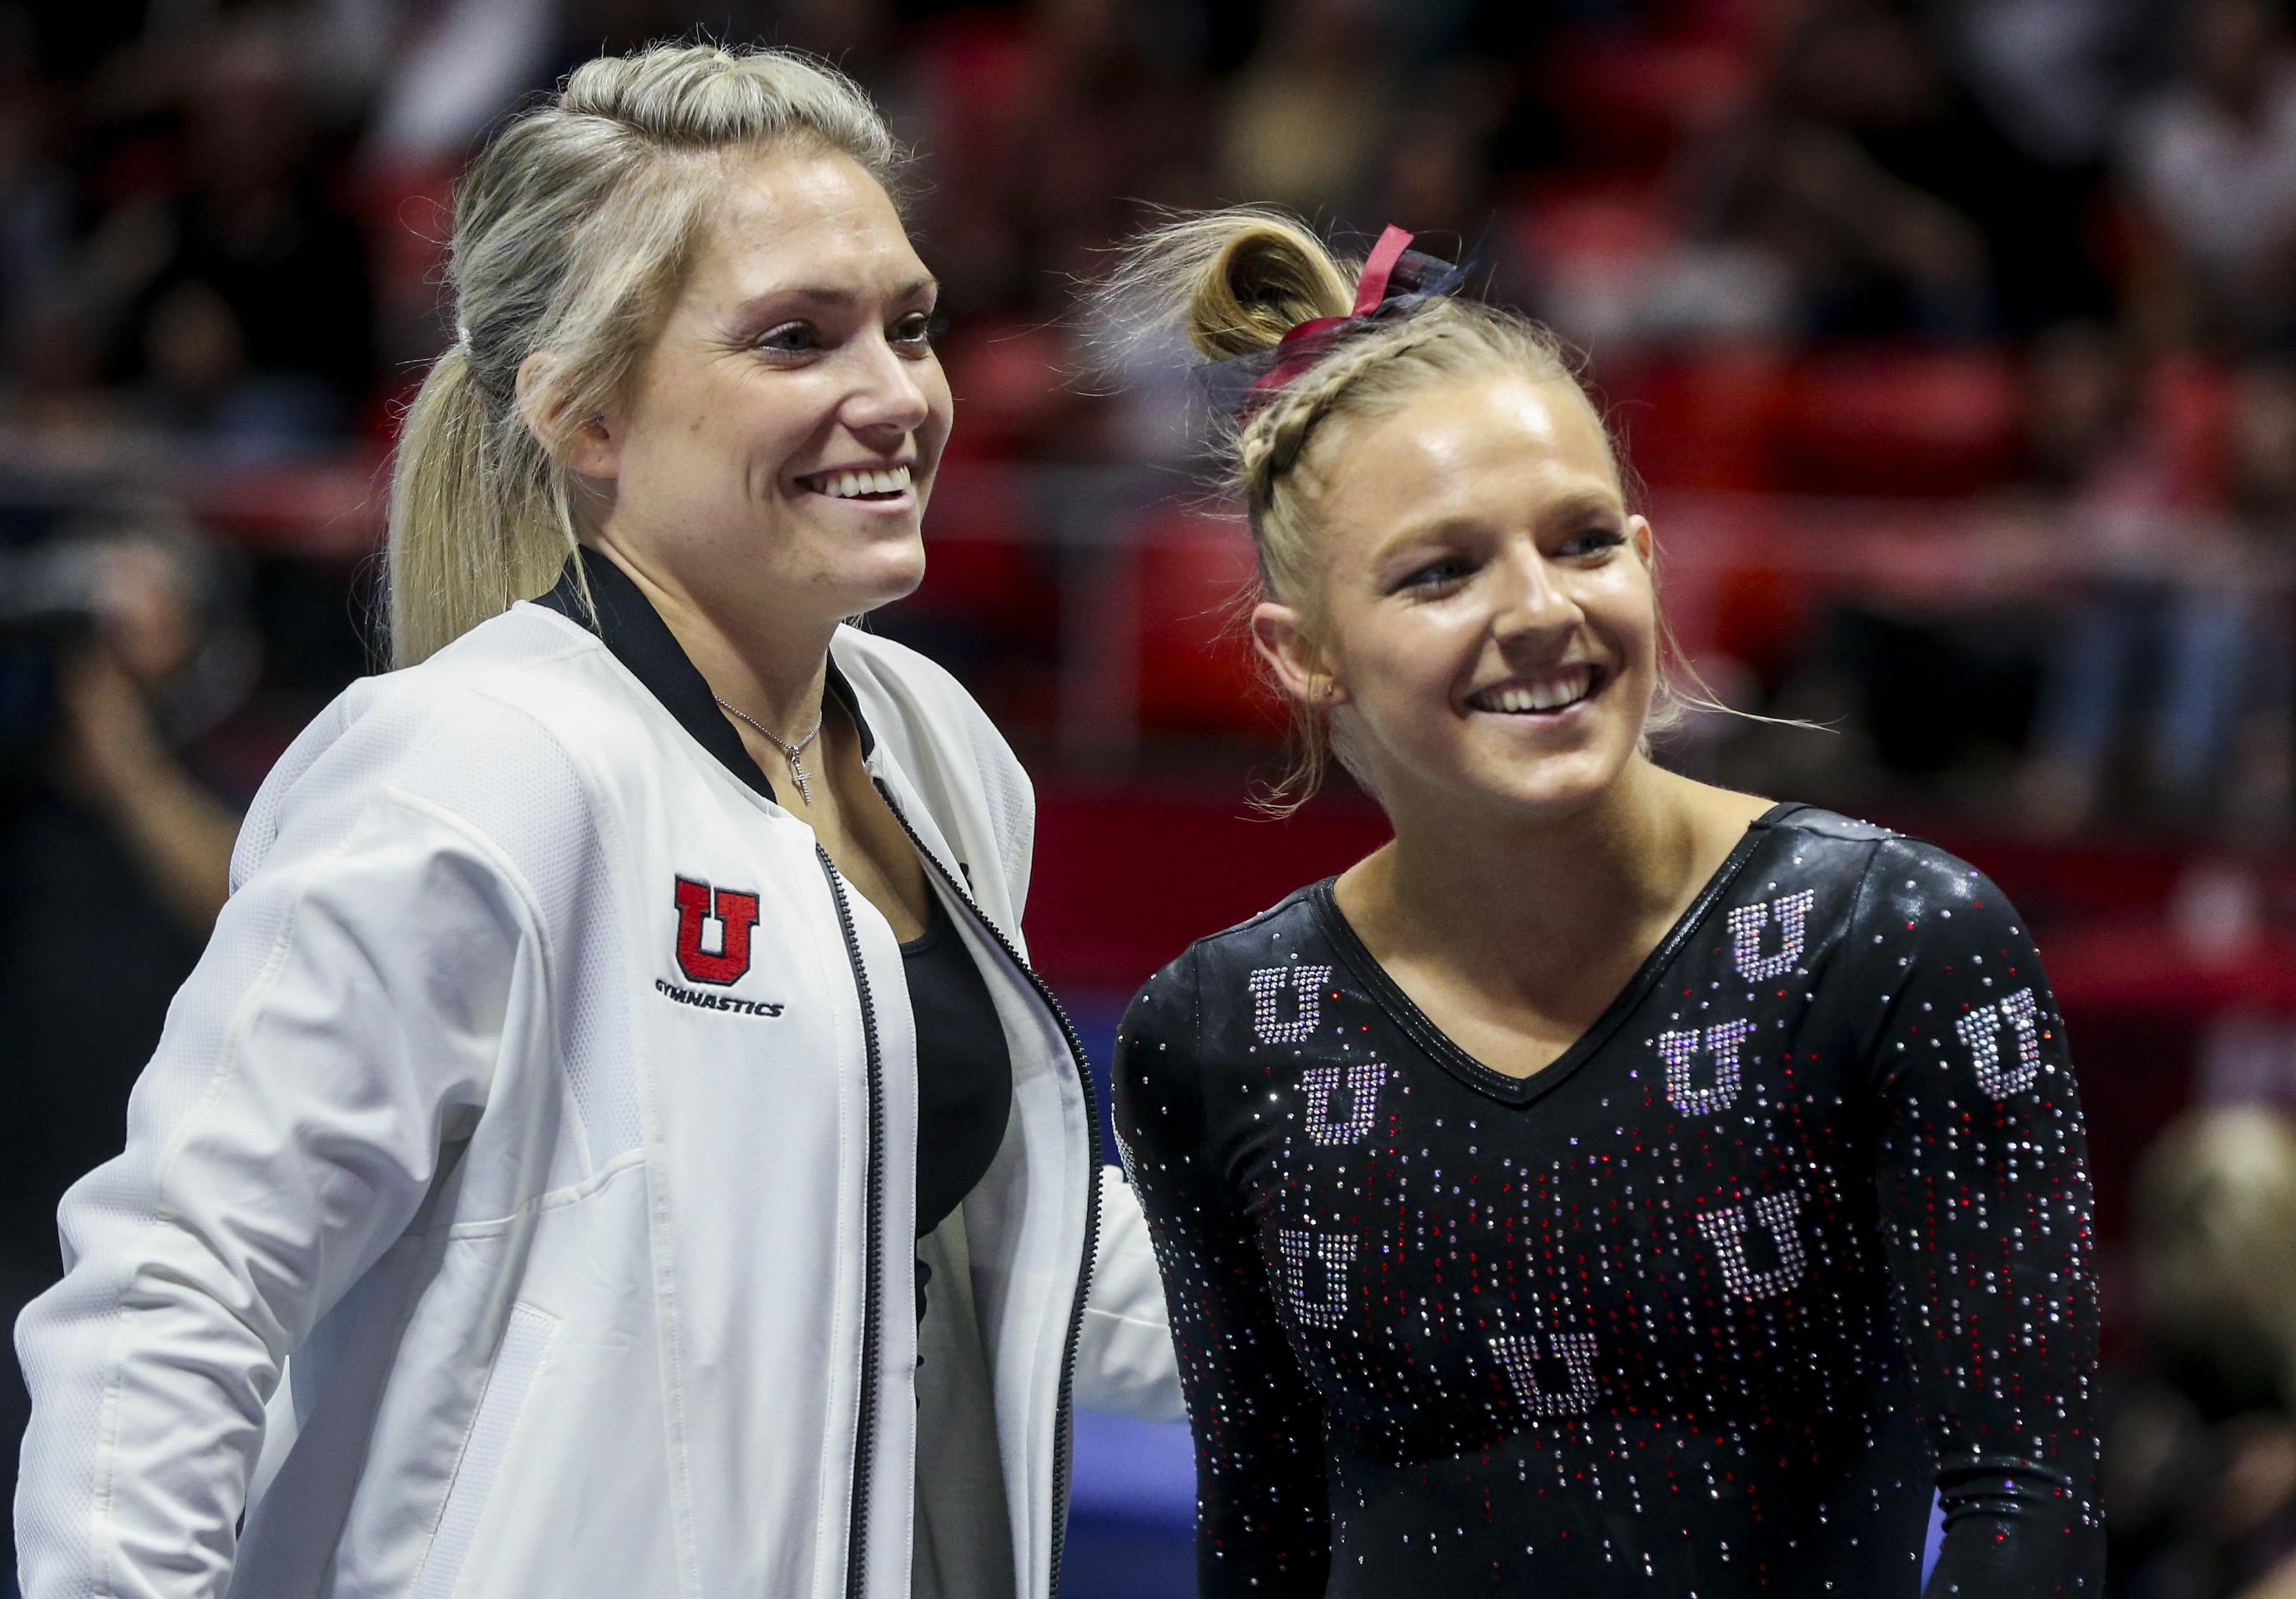 Former Utah assistant coach Courtney McCool Griffeth and gymnast Jillian Hoffman smile after Hoffman's floor peformance.